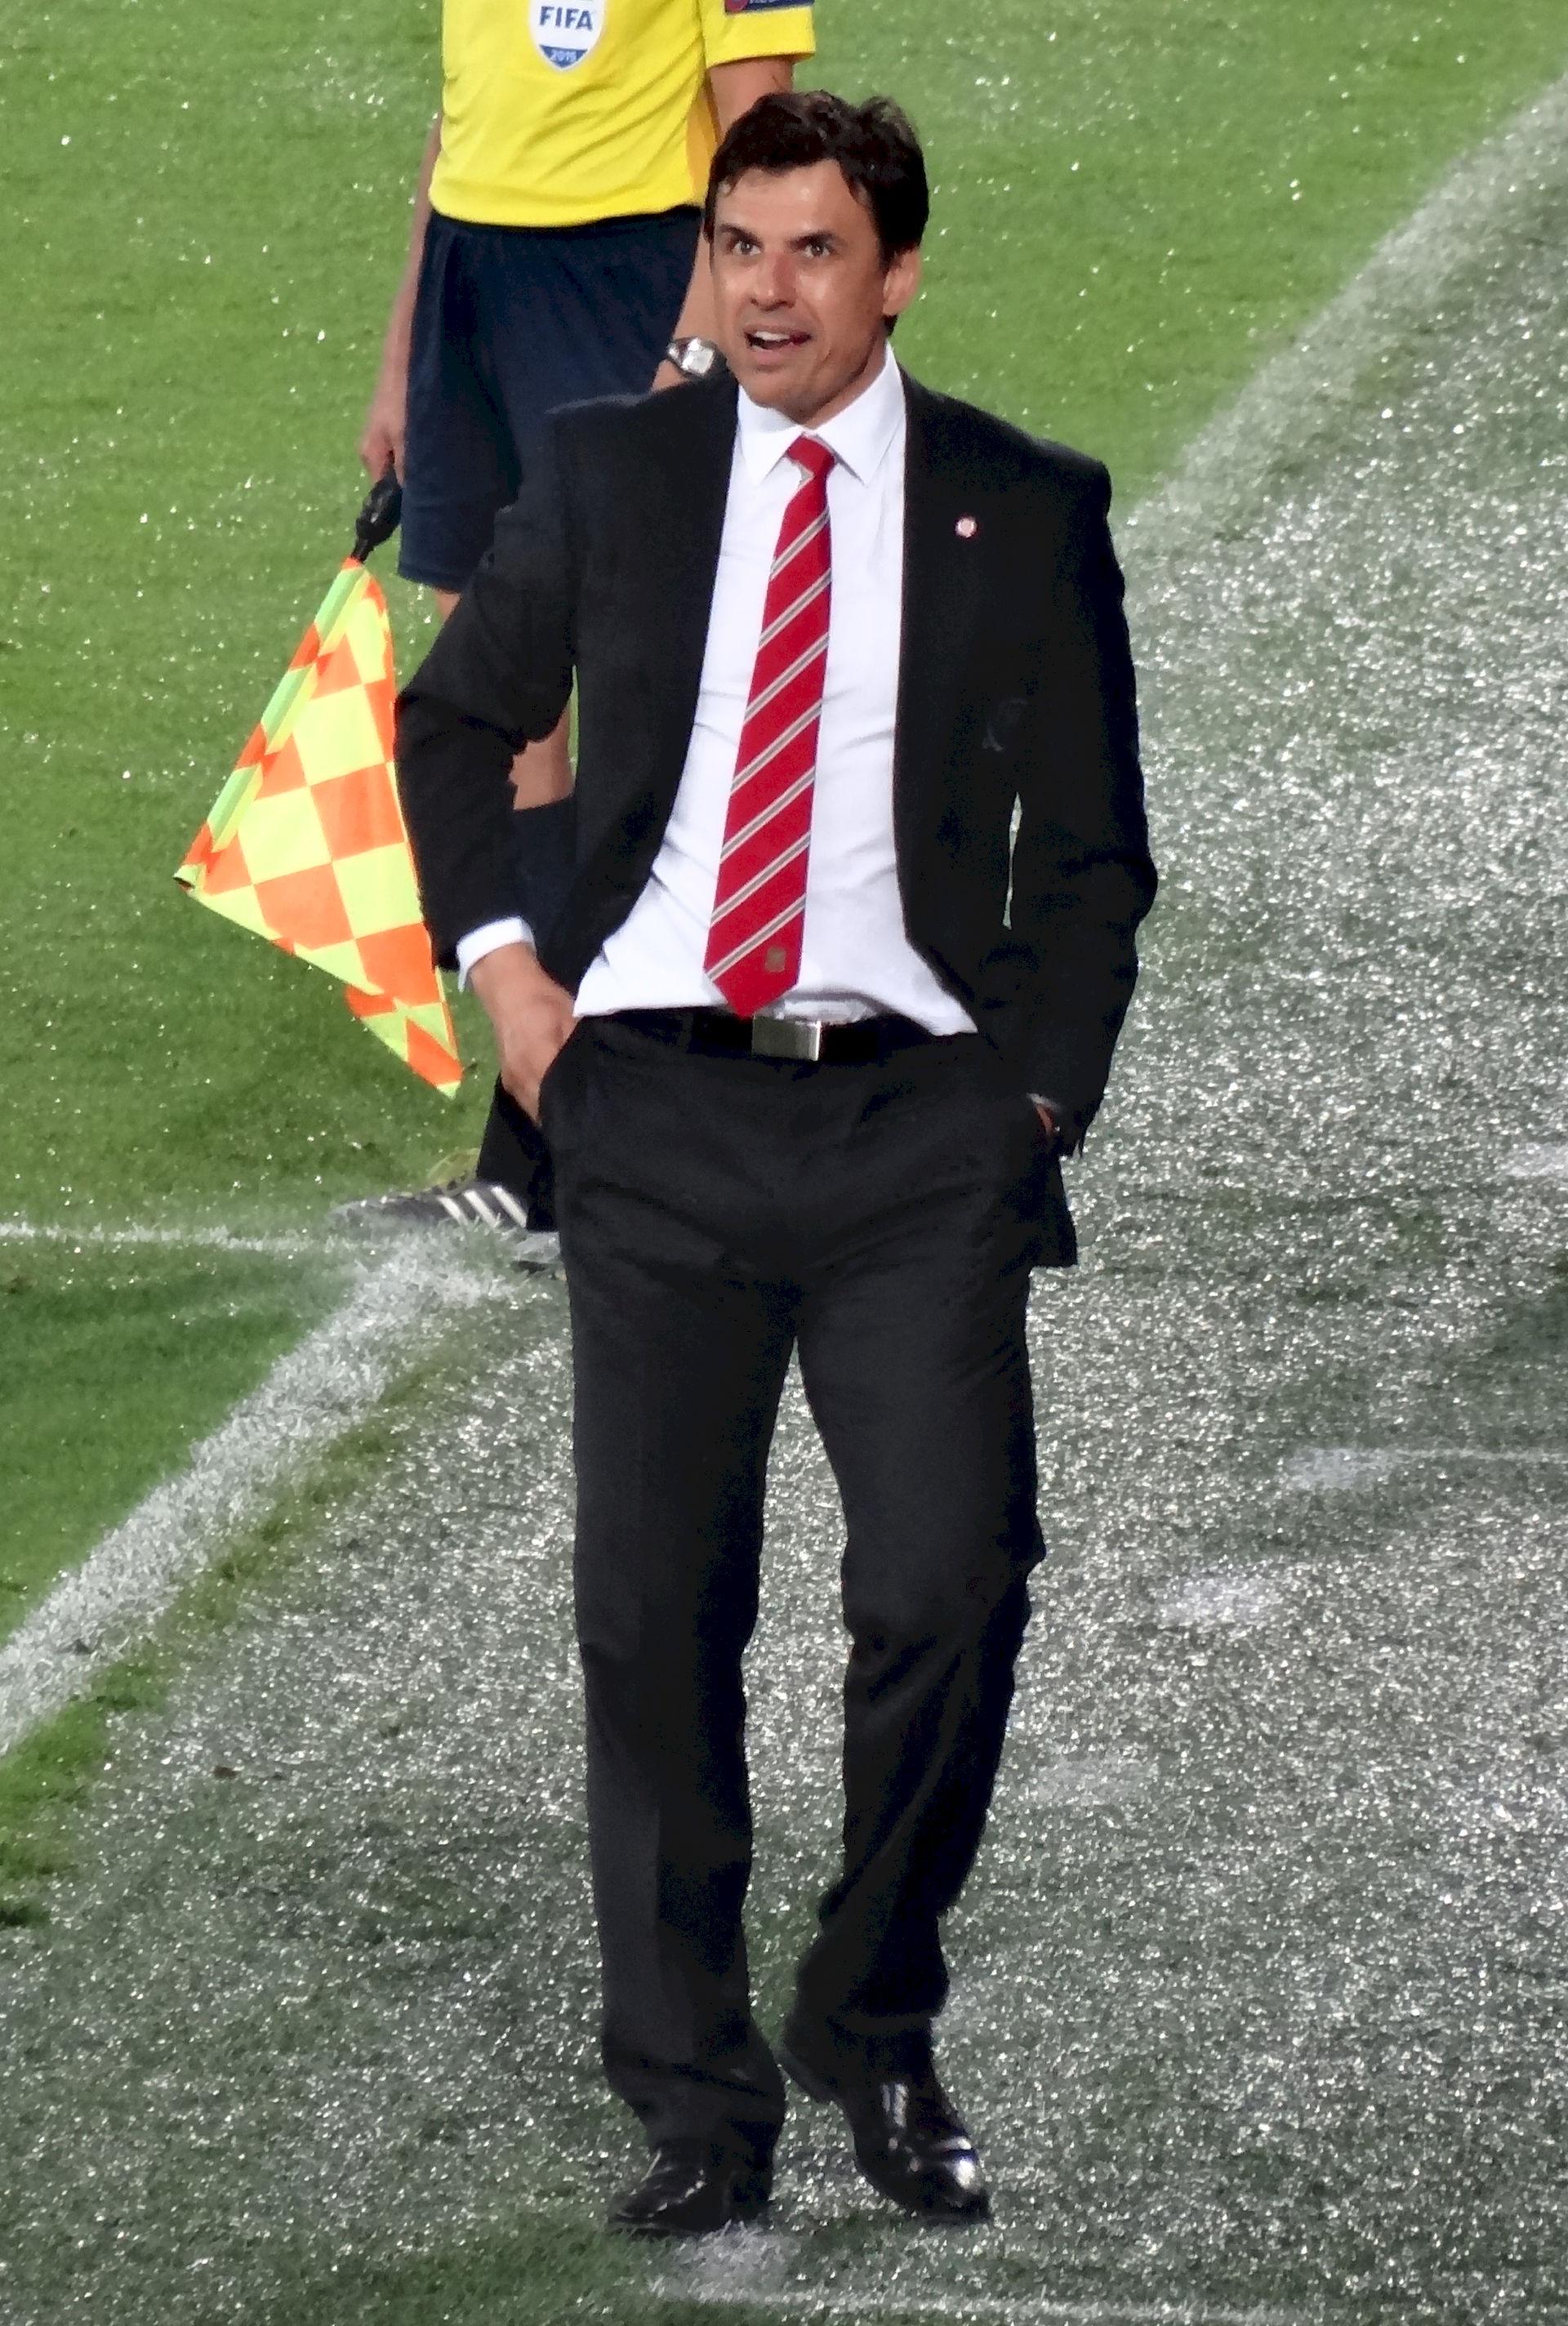 Photo of Chris Coleman (footballer): Footballer; Wales football manager